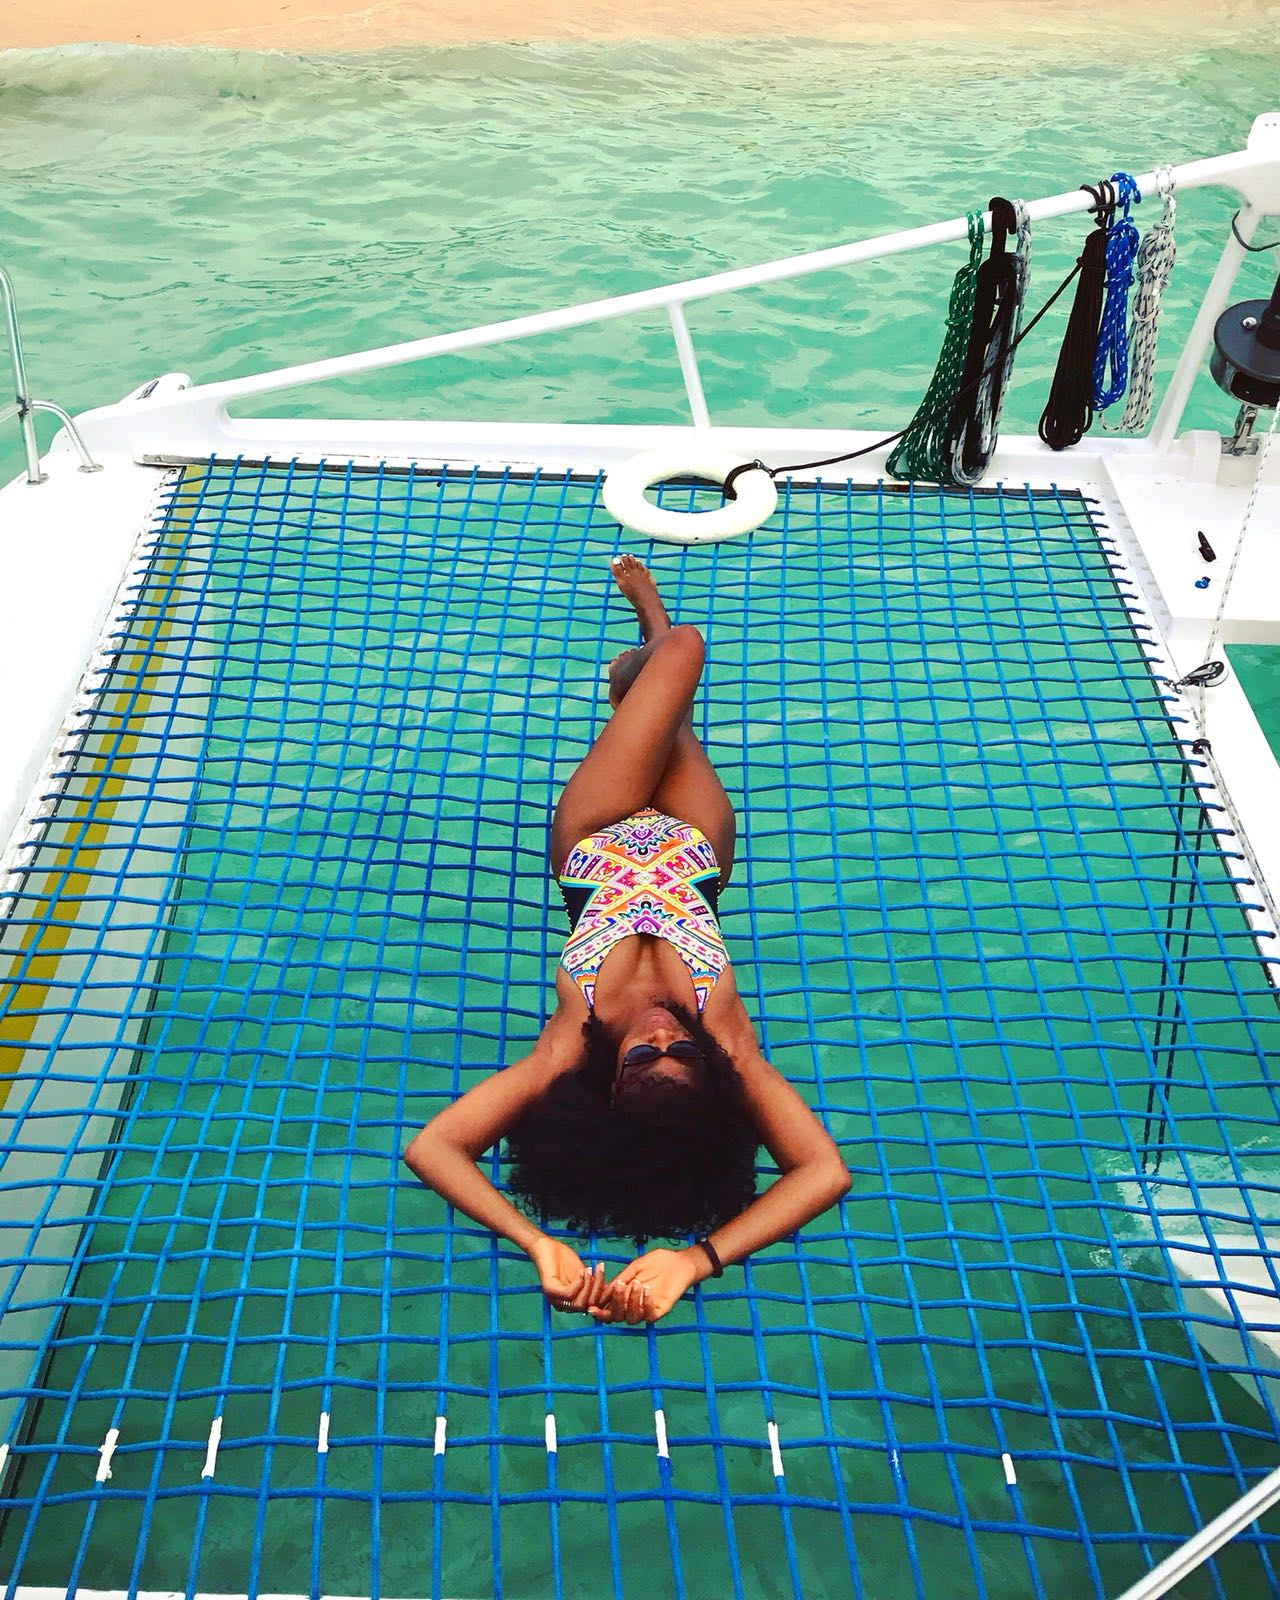 Isla Cacos   burning 😂😂 on a catamaran